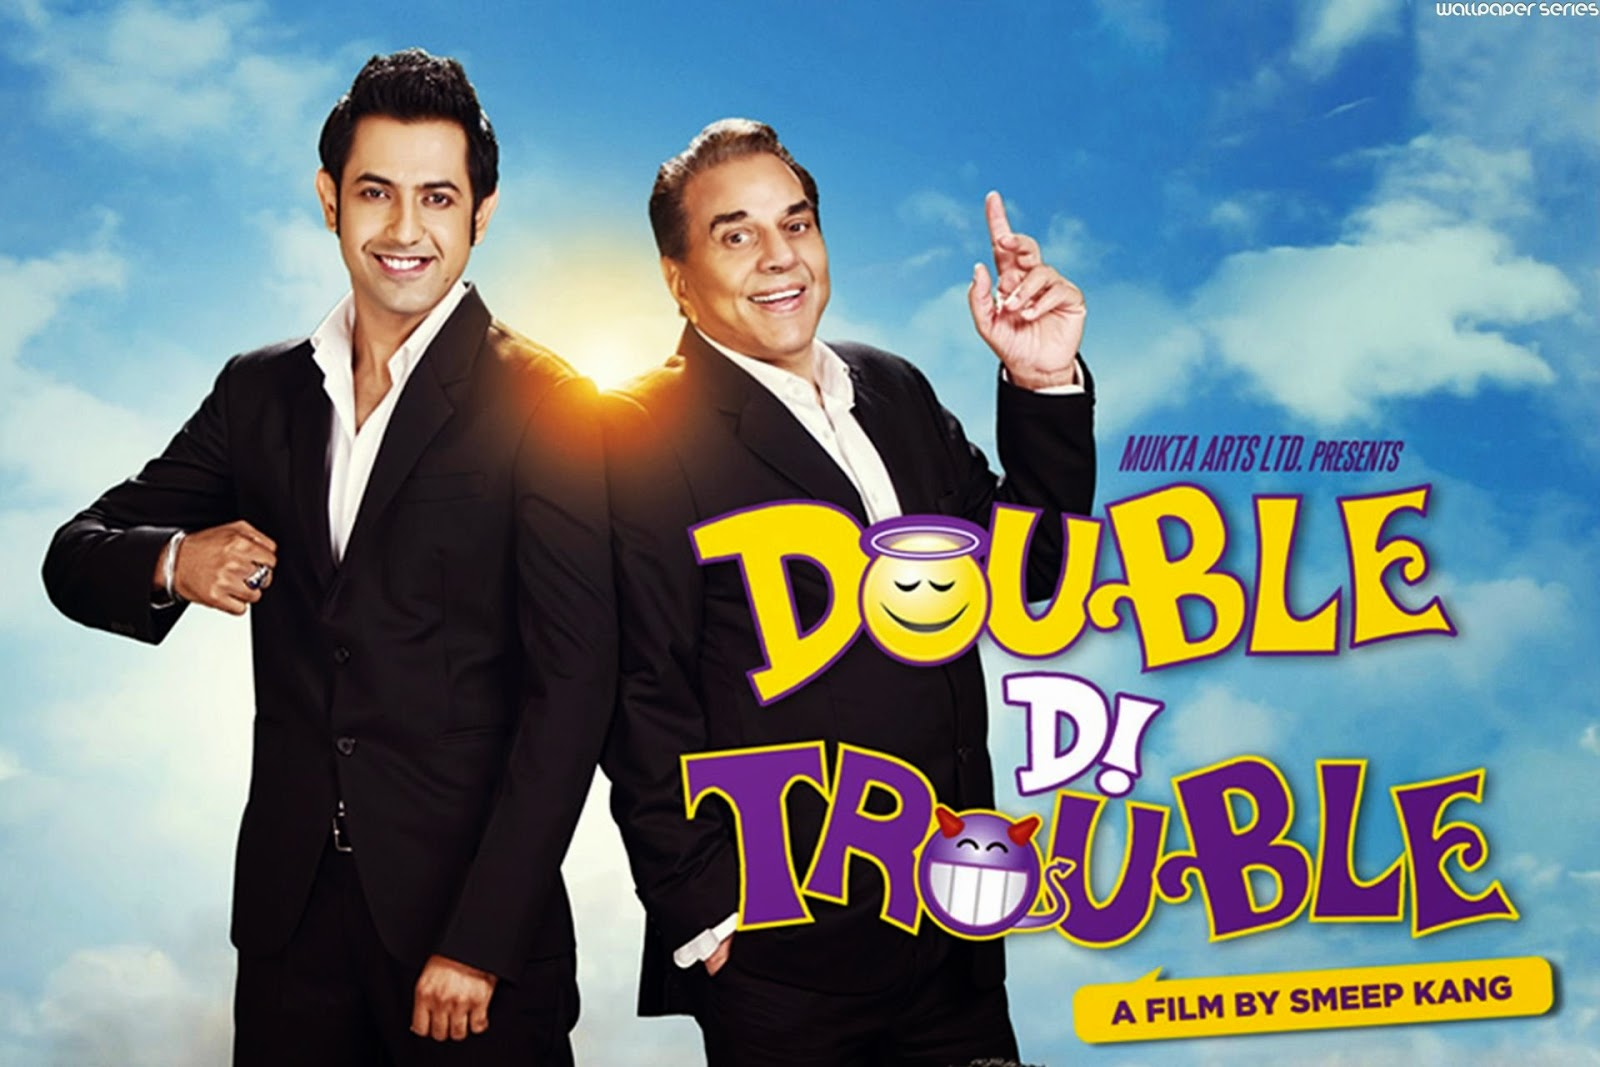 New punjabi full movies 2014 / Watch dragon ball z episodes